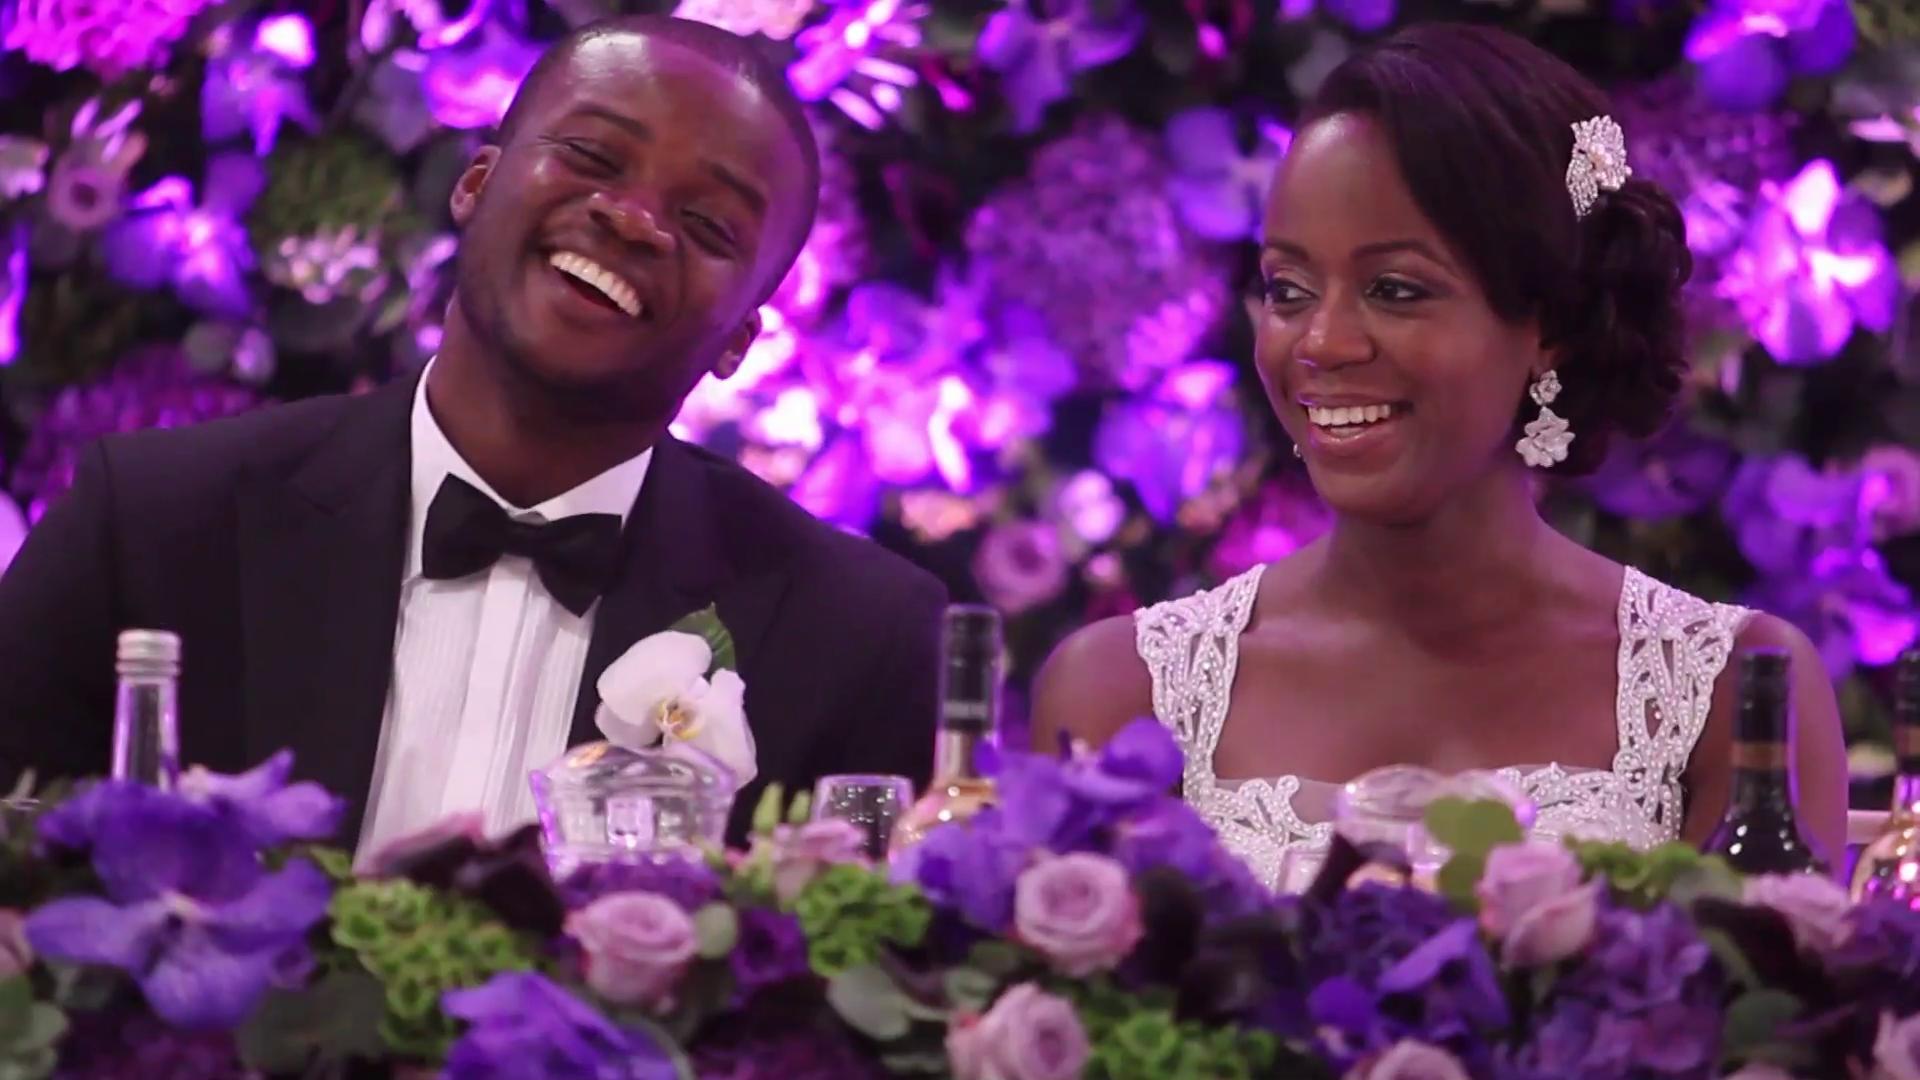 Wedding Videography - Luton Hoo